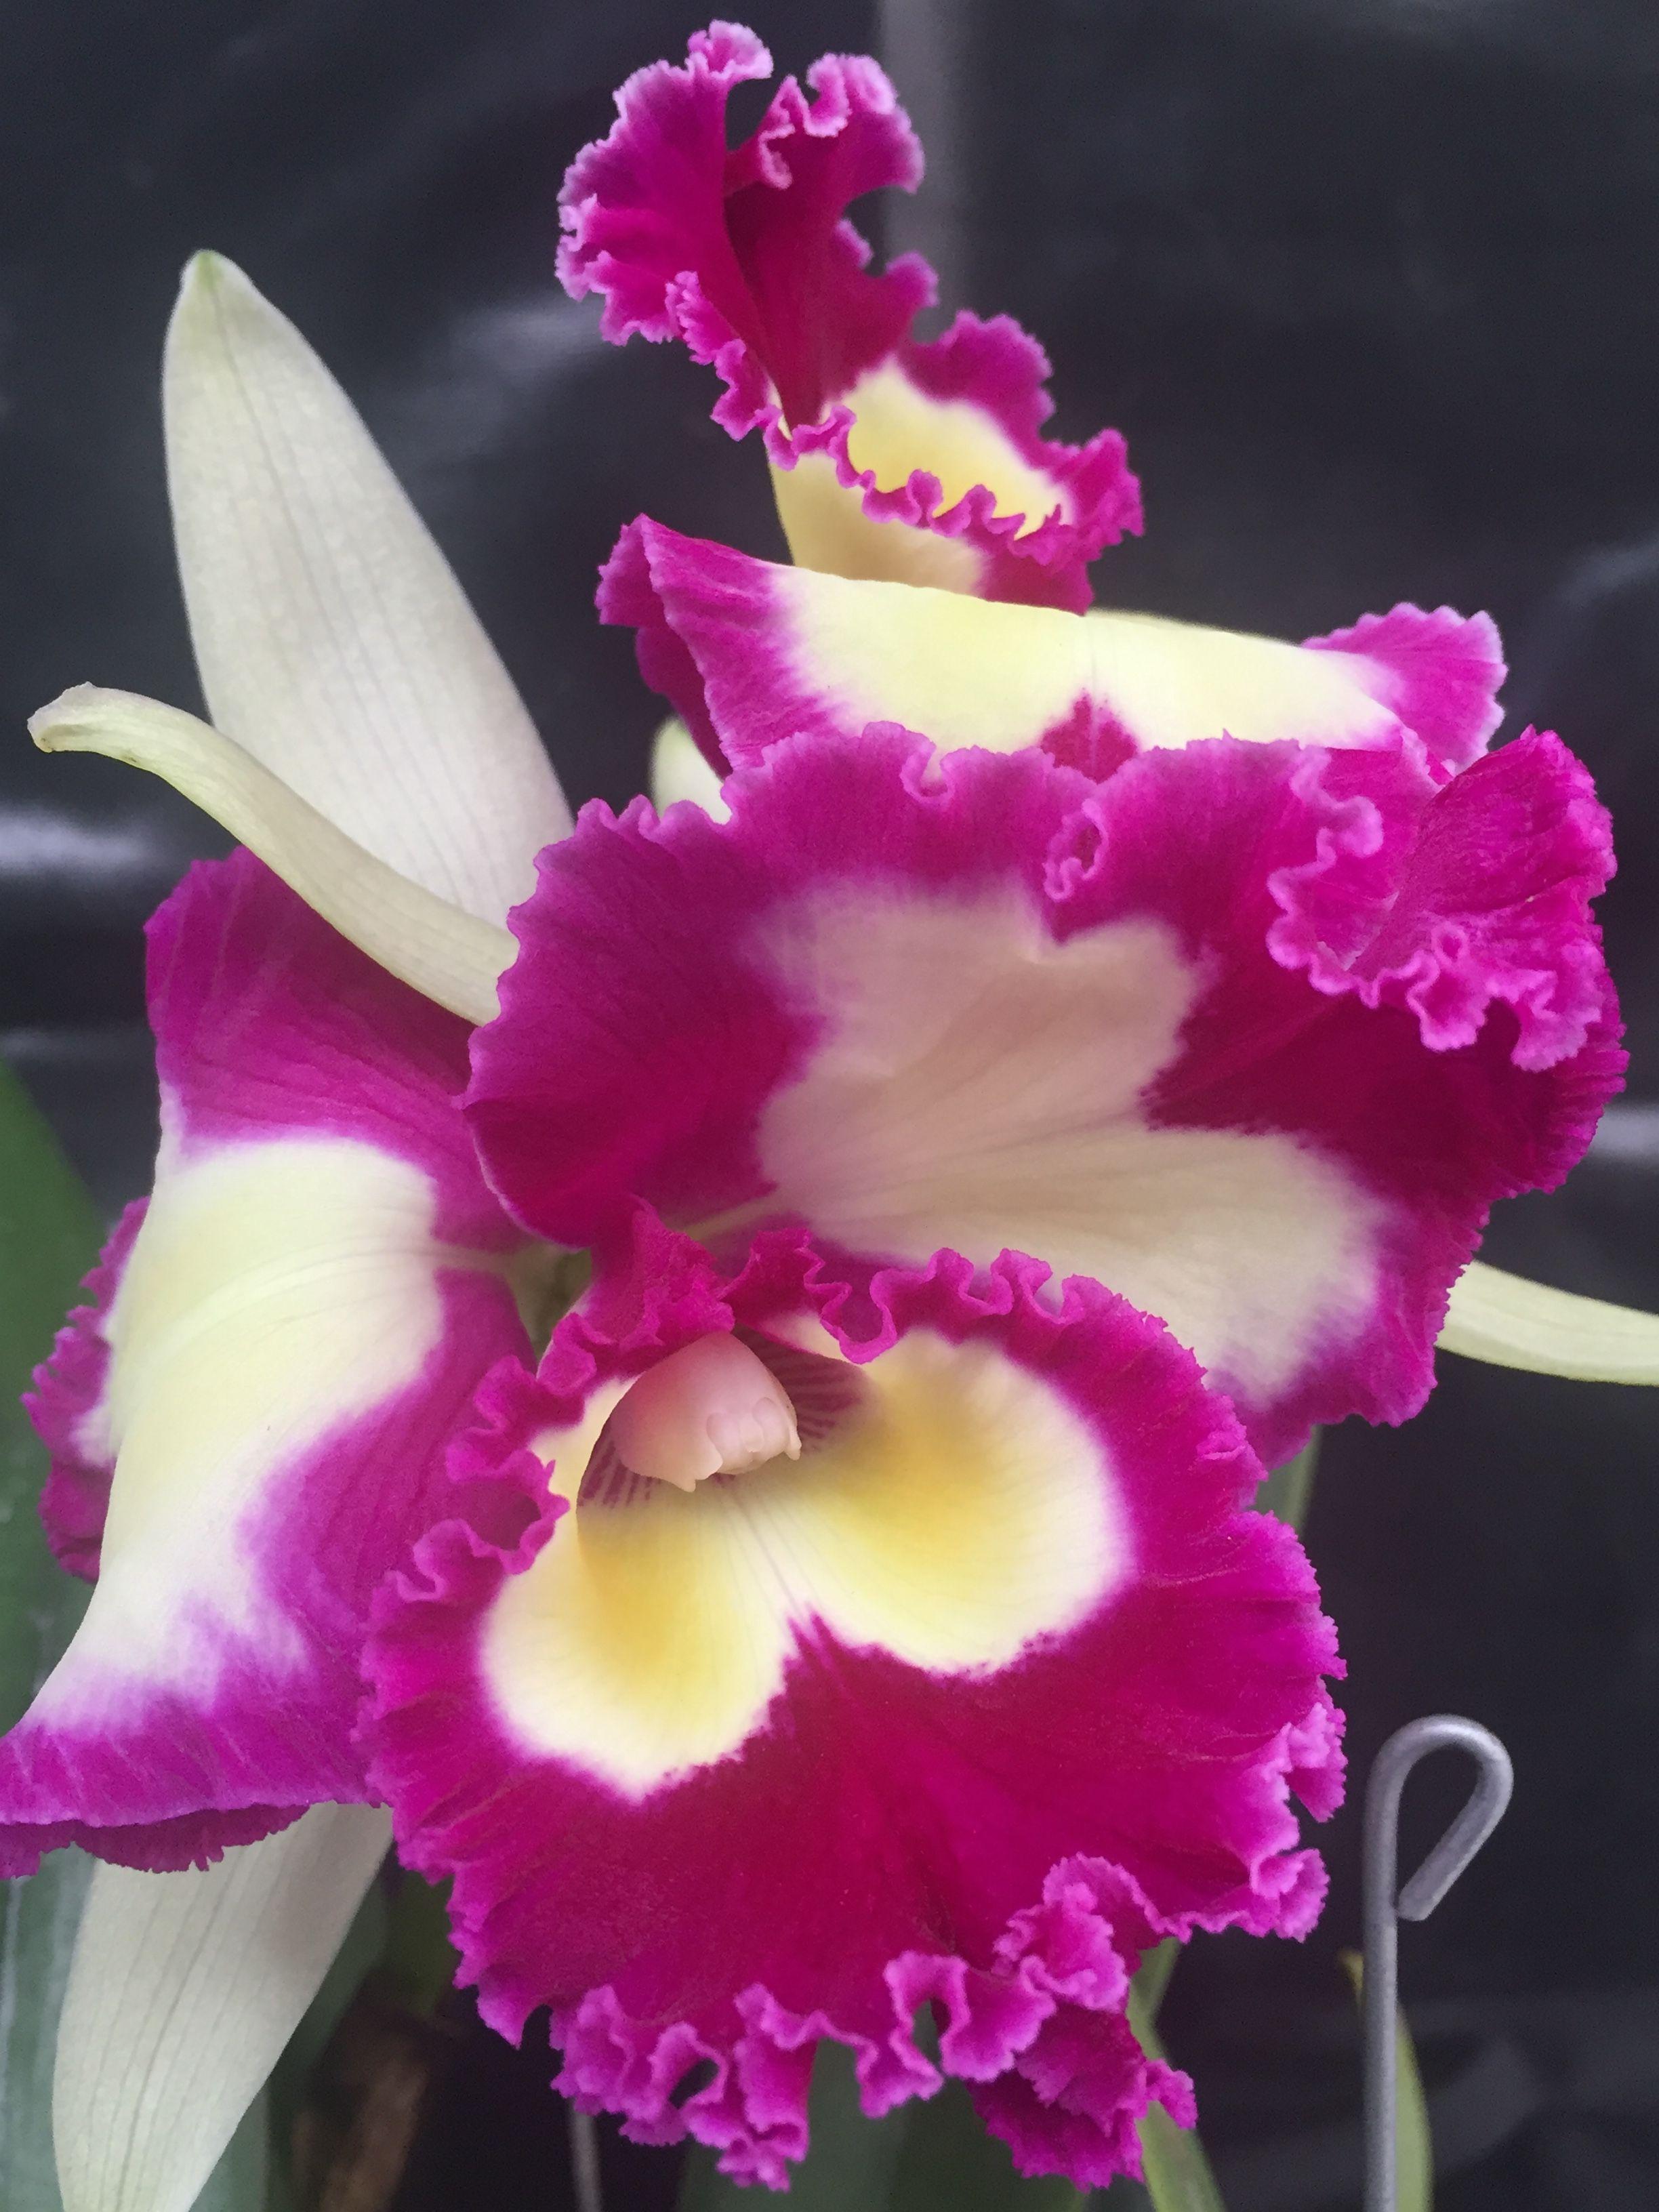 Orquídea Cattleya Rlc Blc Chinese Beauty Caprichosa Flores